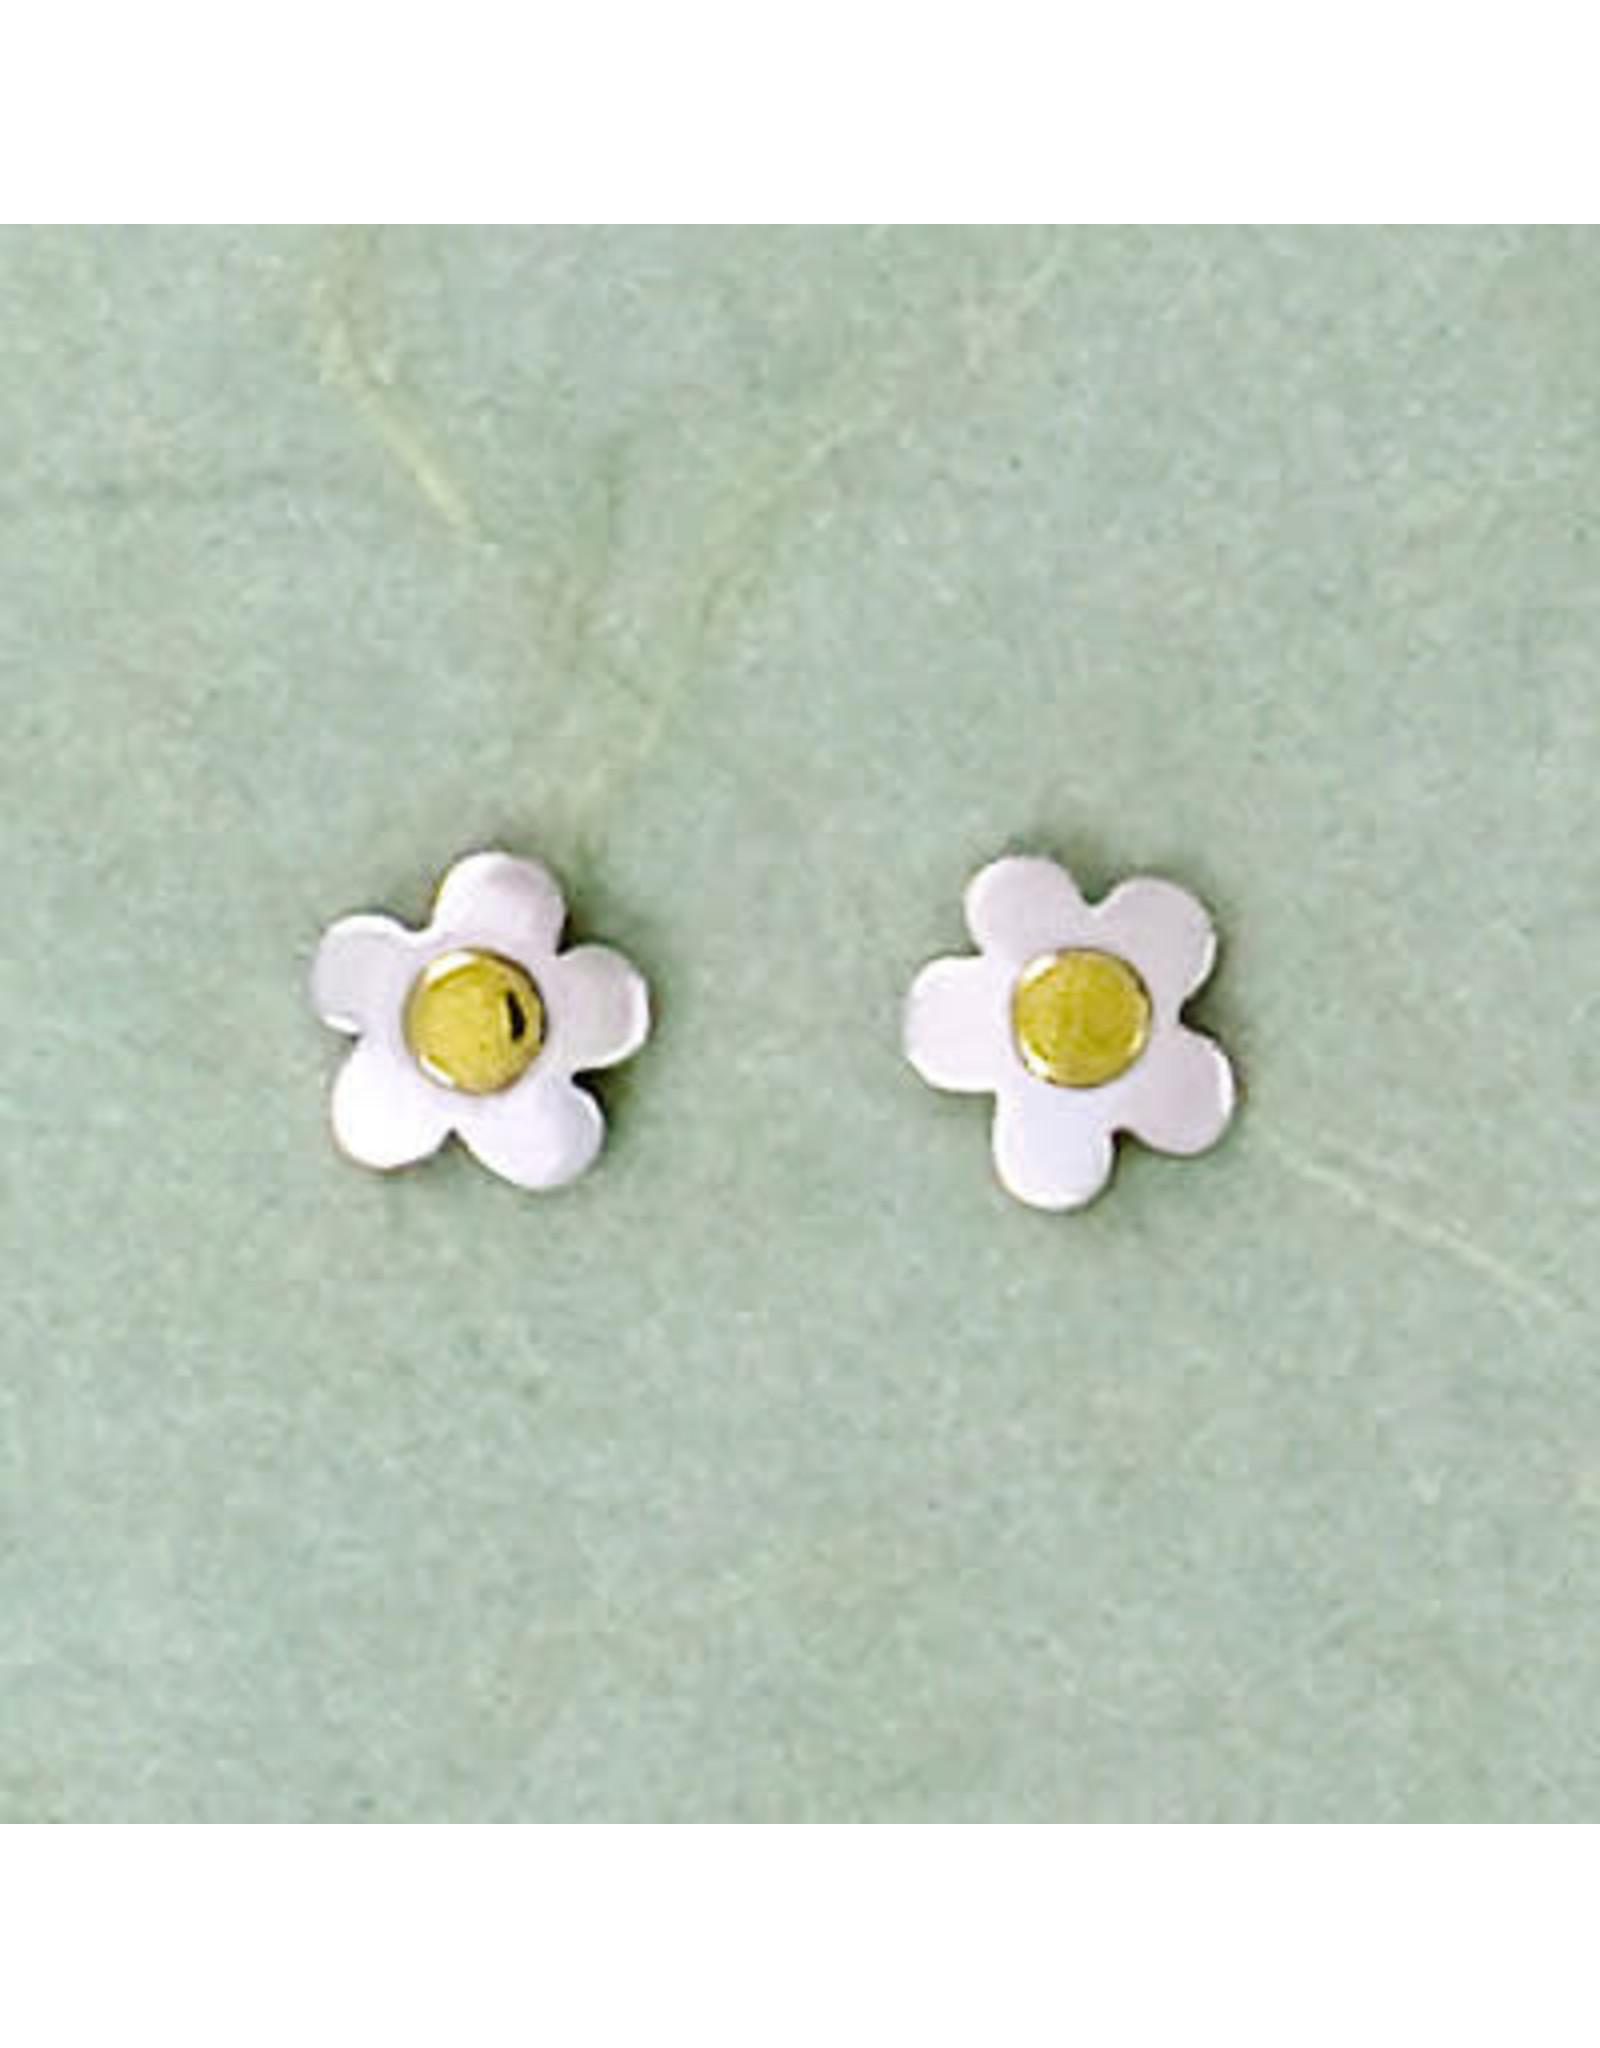 Sterling Silver Flower Post Earrings, Mexico